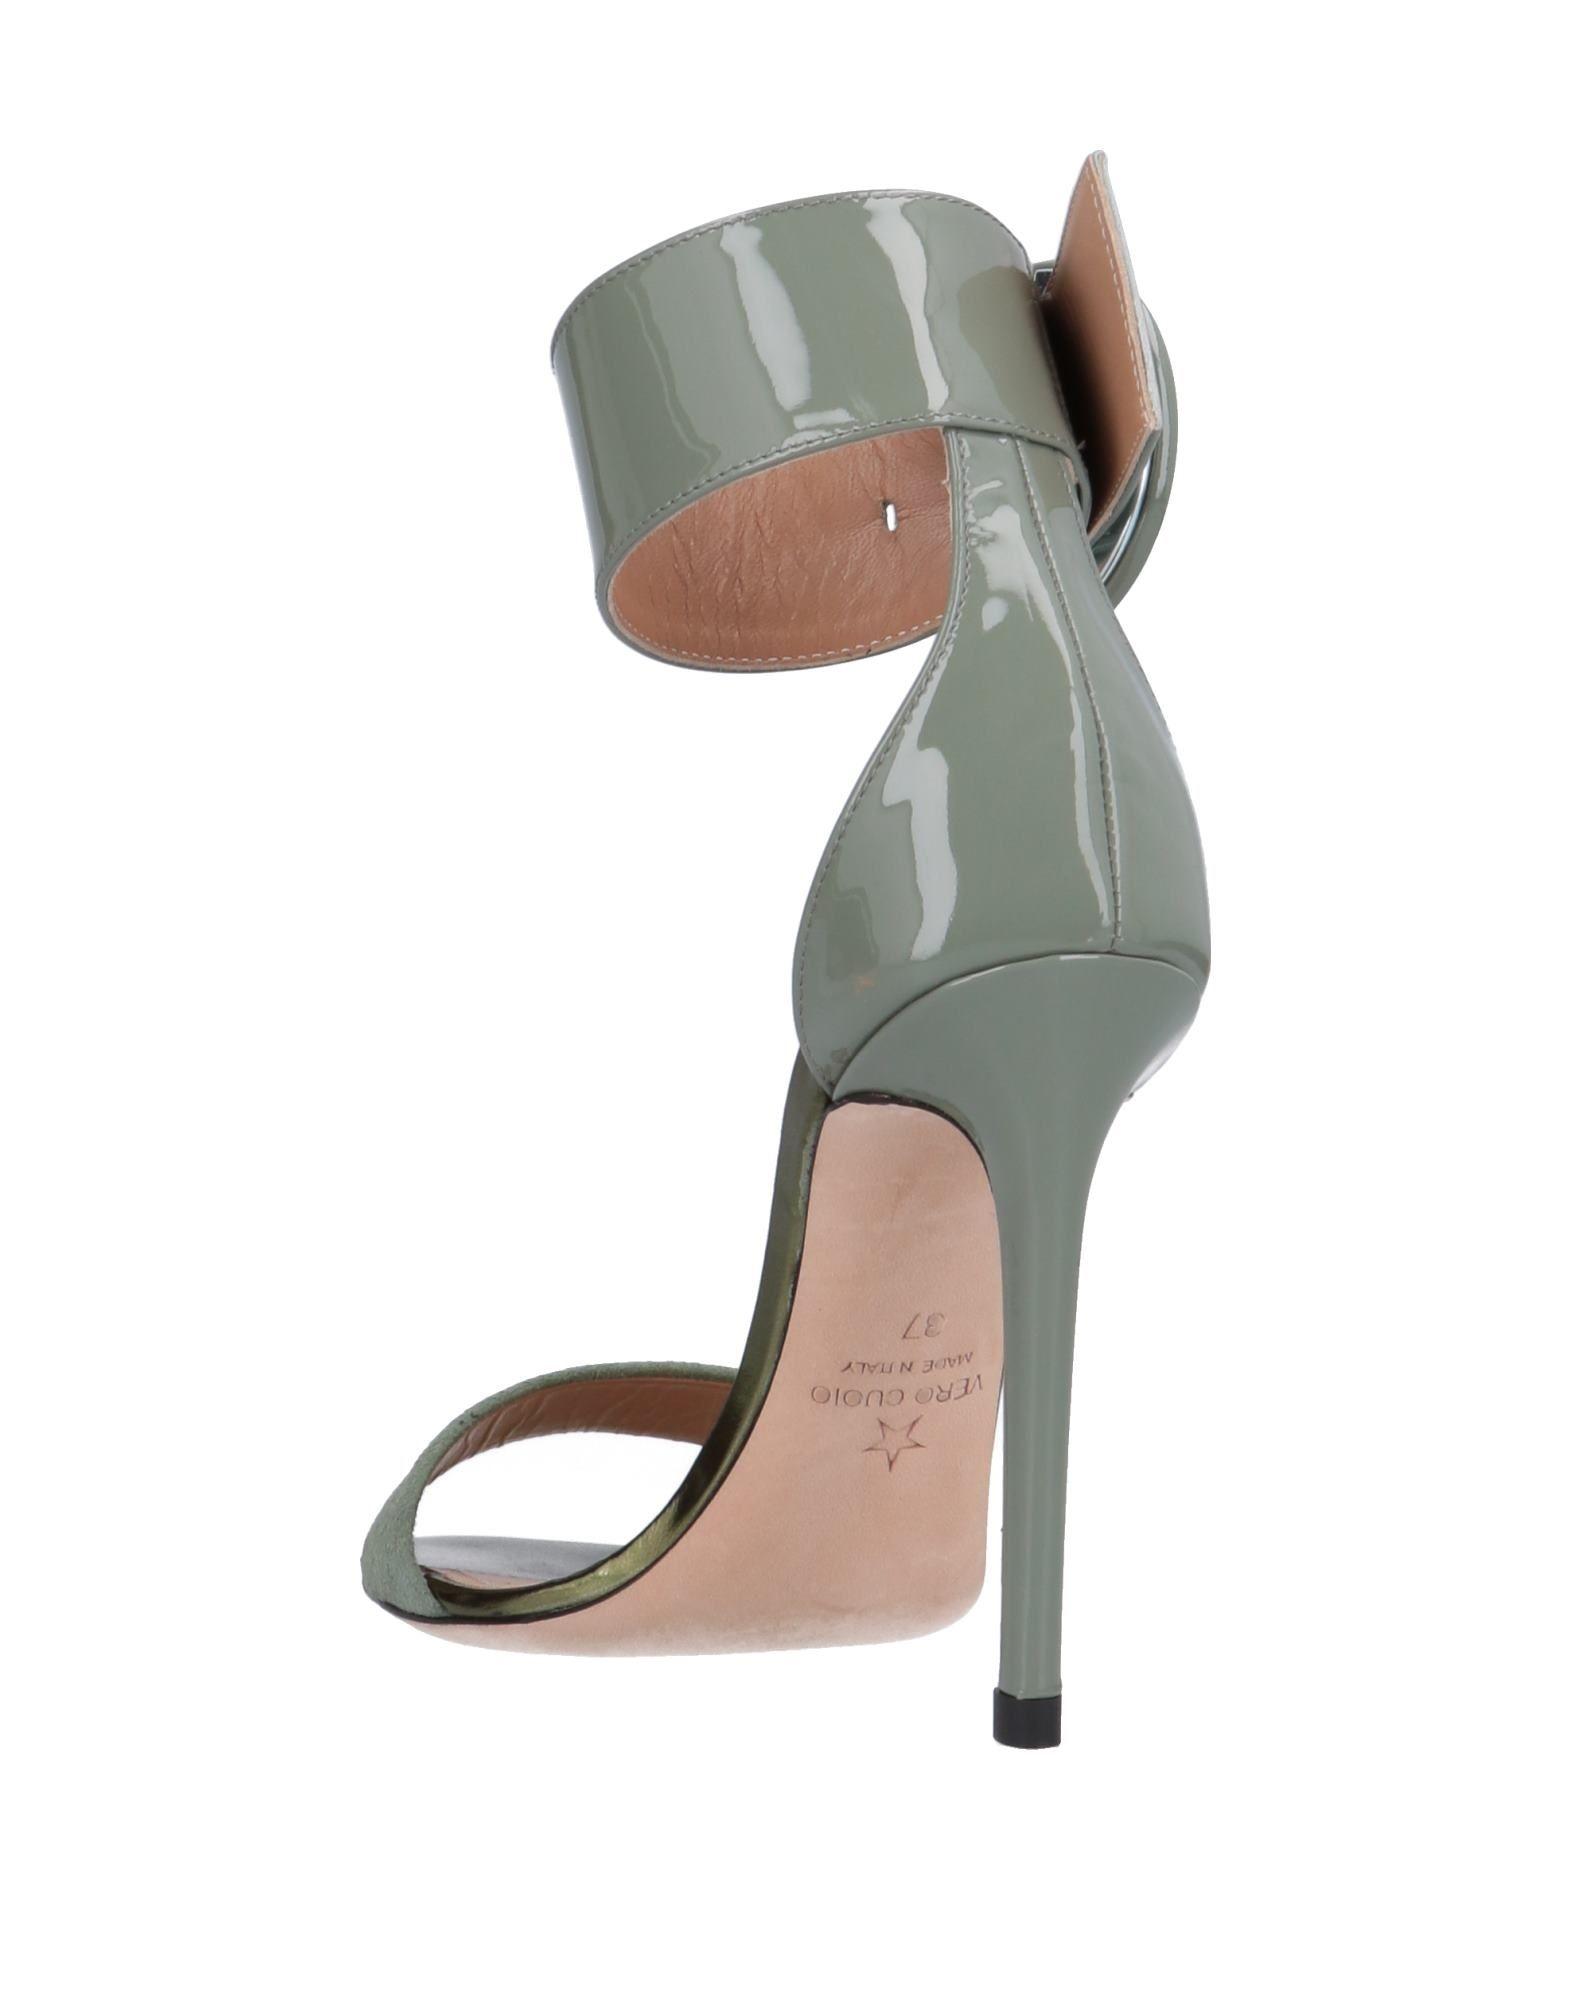 Stilvolle billige Schuhe Damen Marc Ellis Sandalen Damen Schuhe  11567260KX 0ef4f3